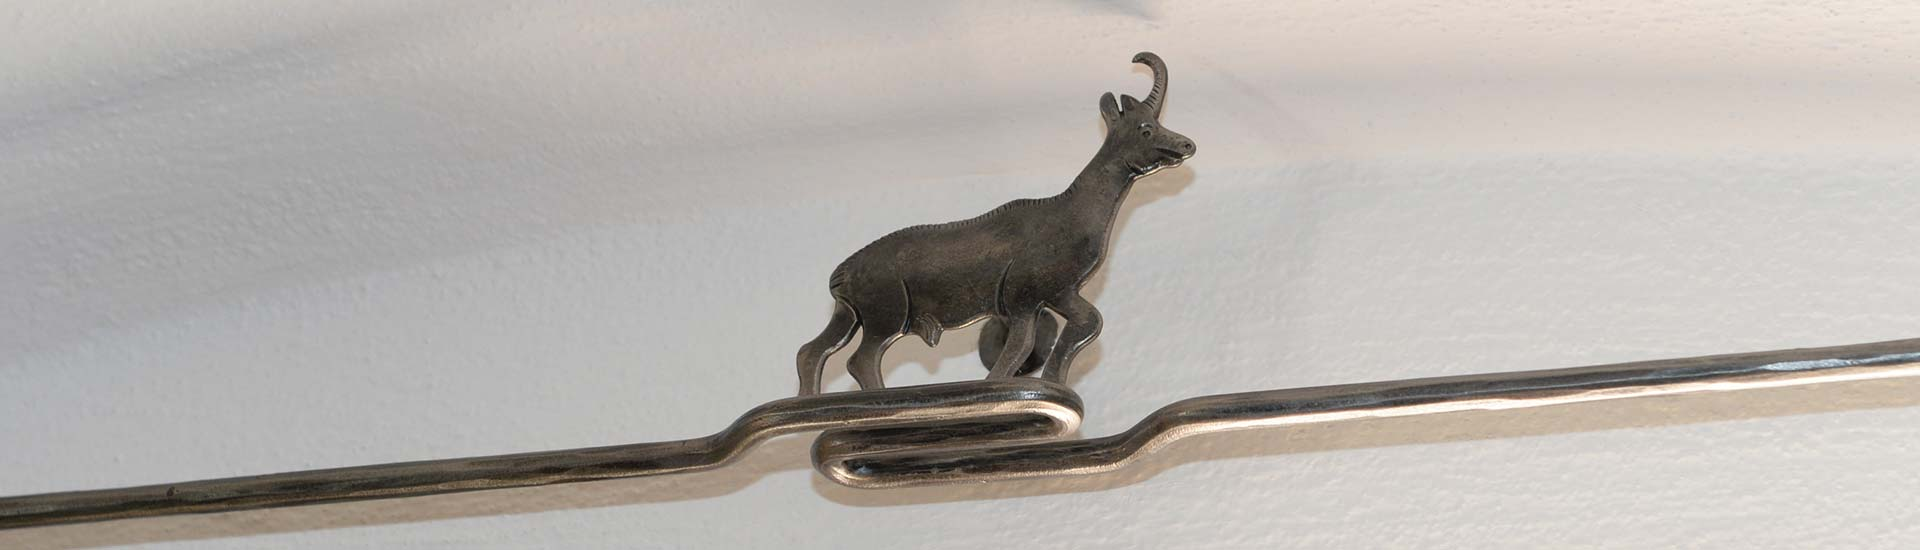 gams-ornament